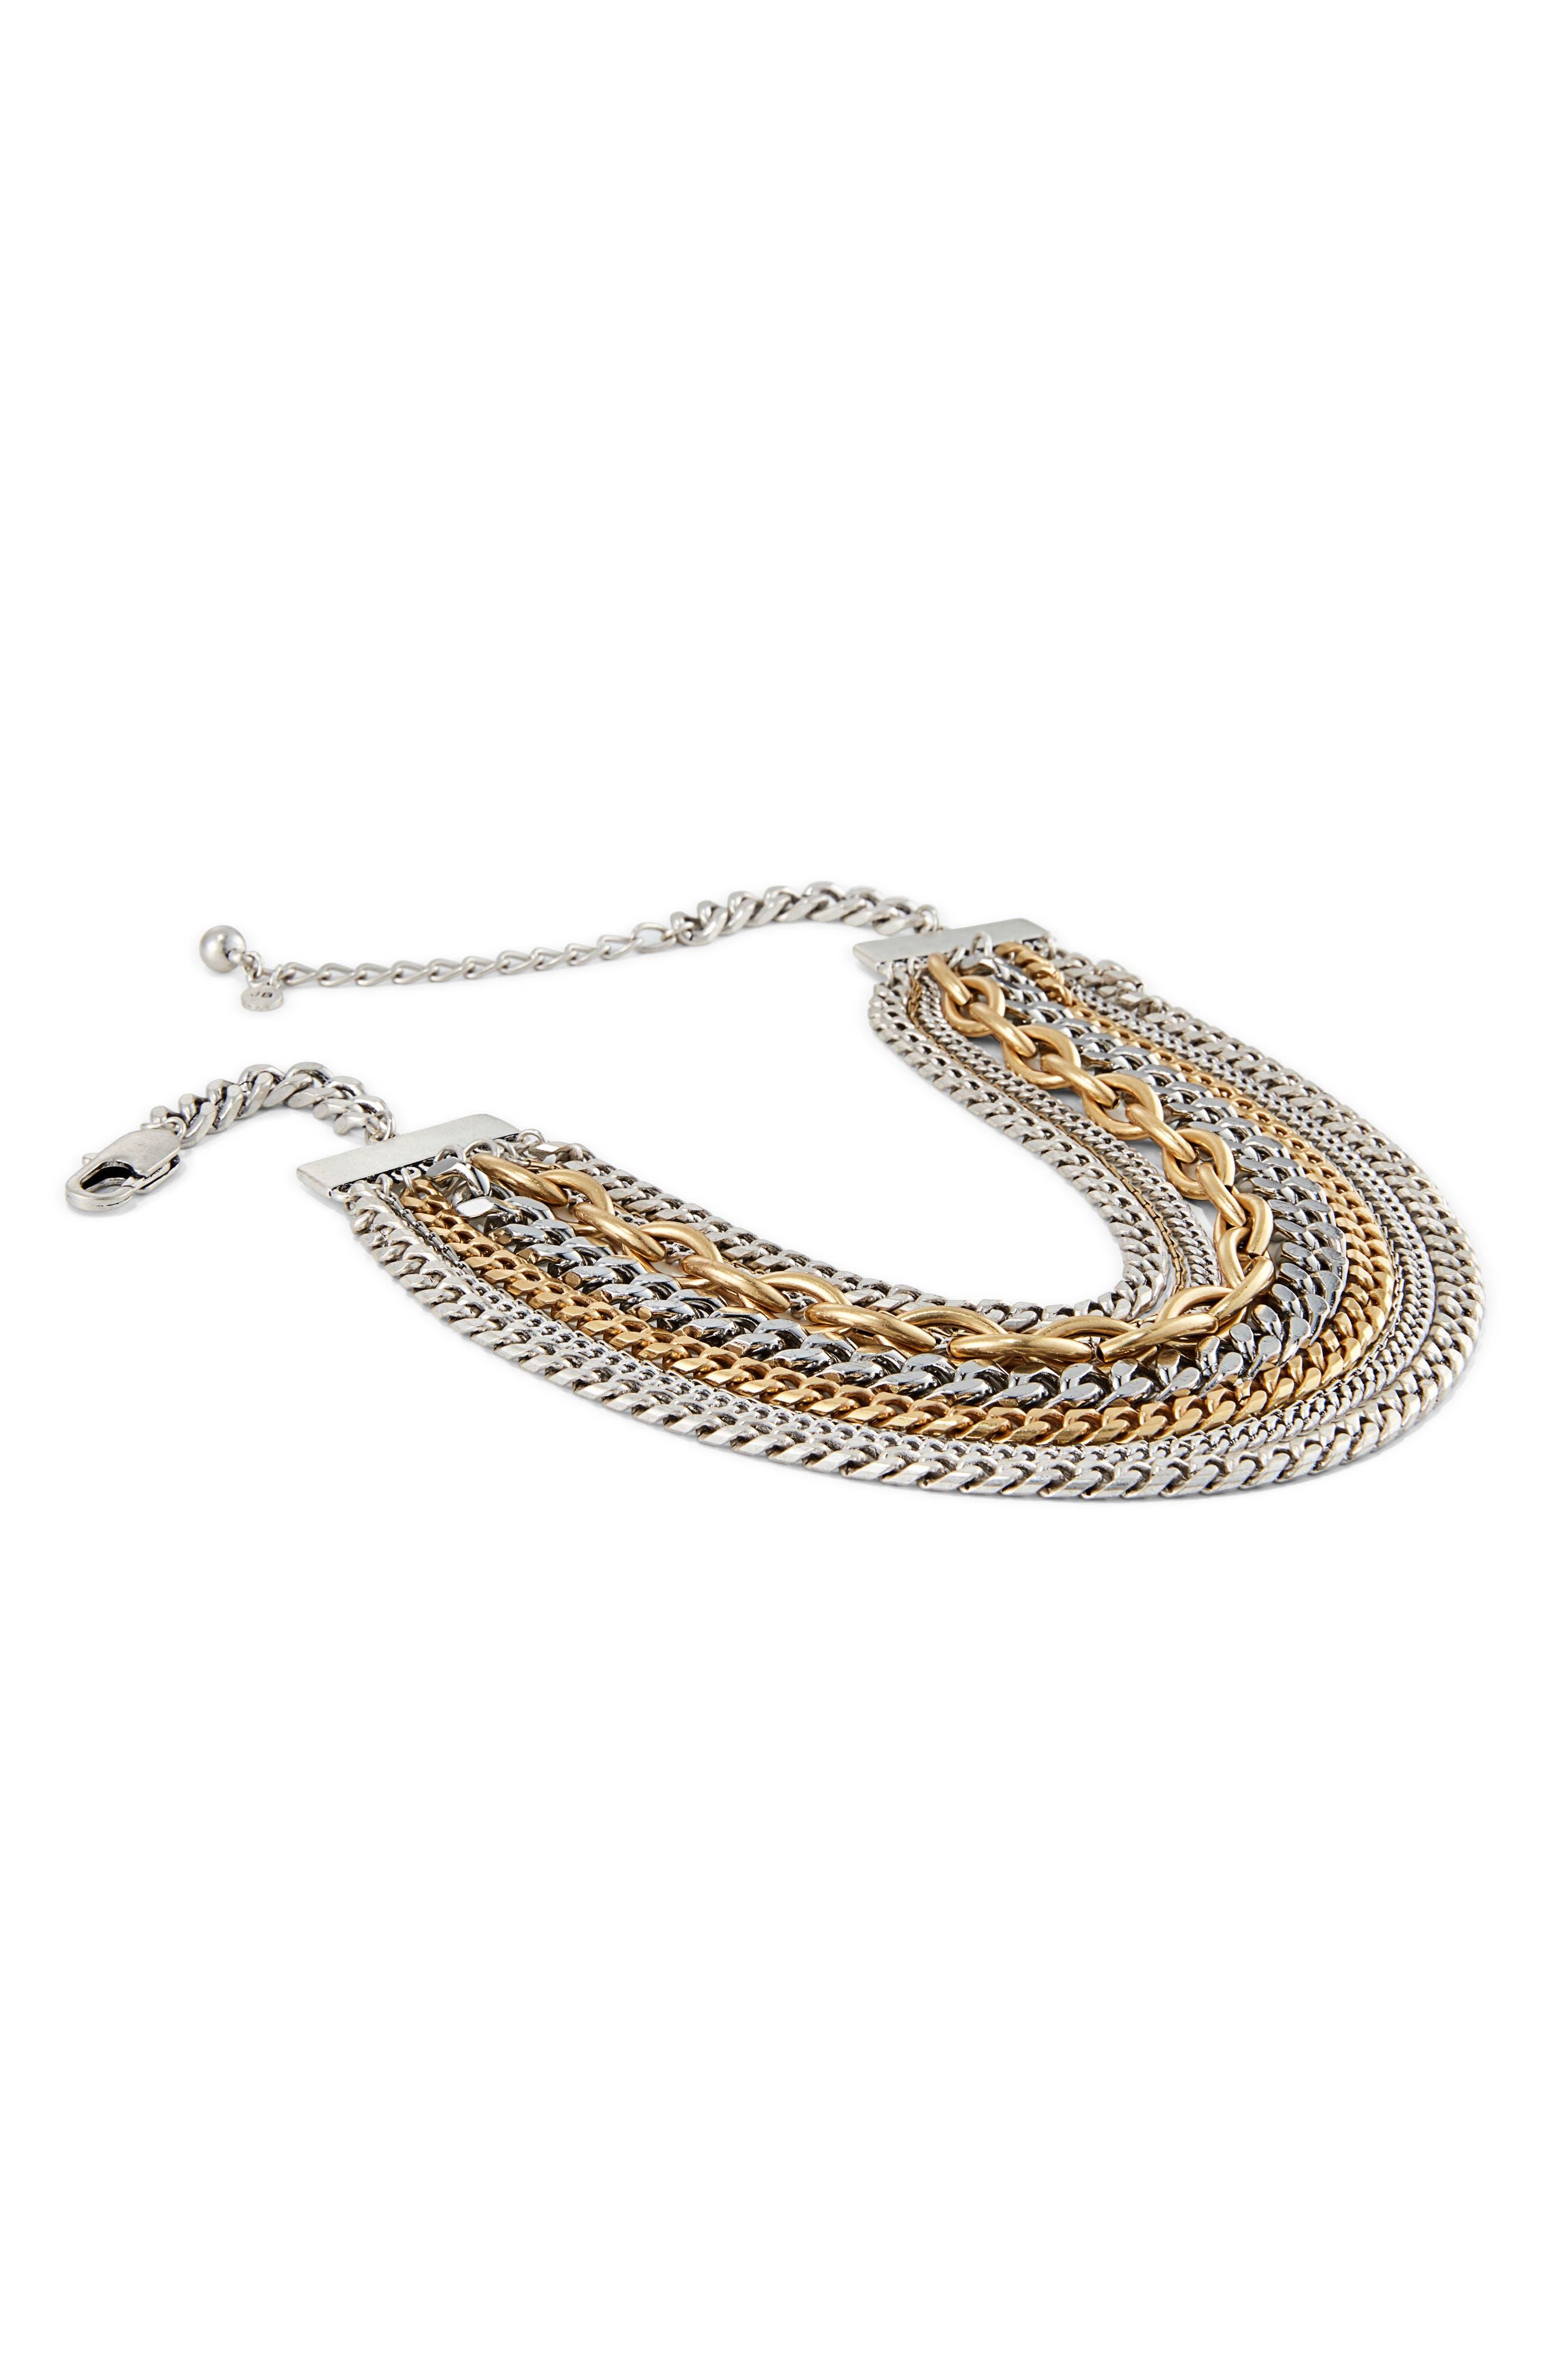 Marra Collar Necklace,                             Alternate thumbnail 4, color,                             040